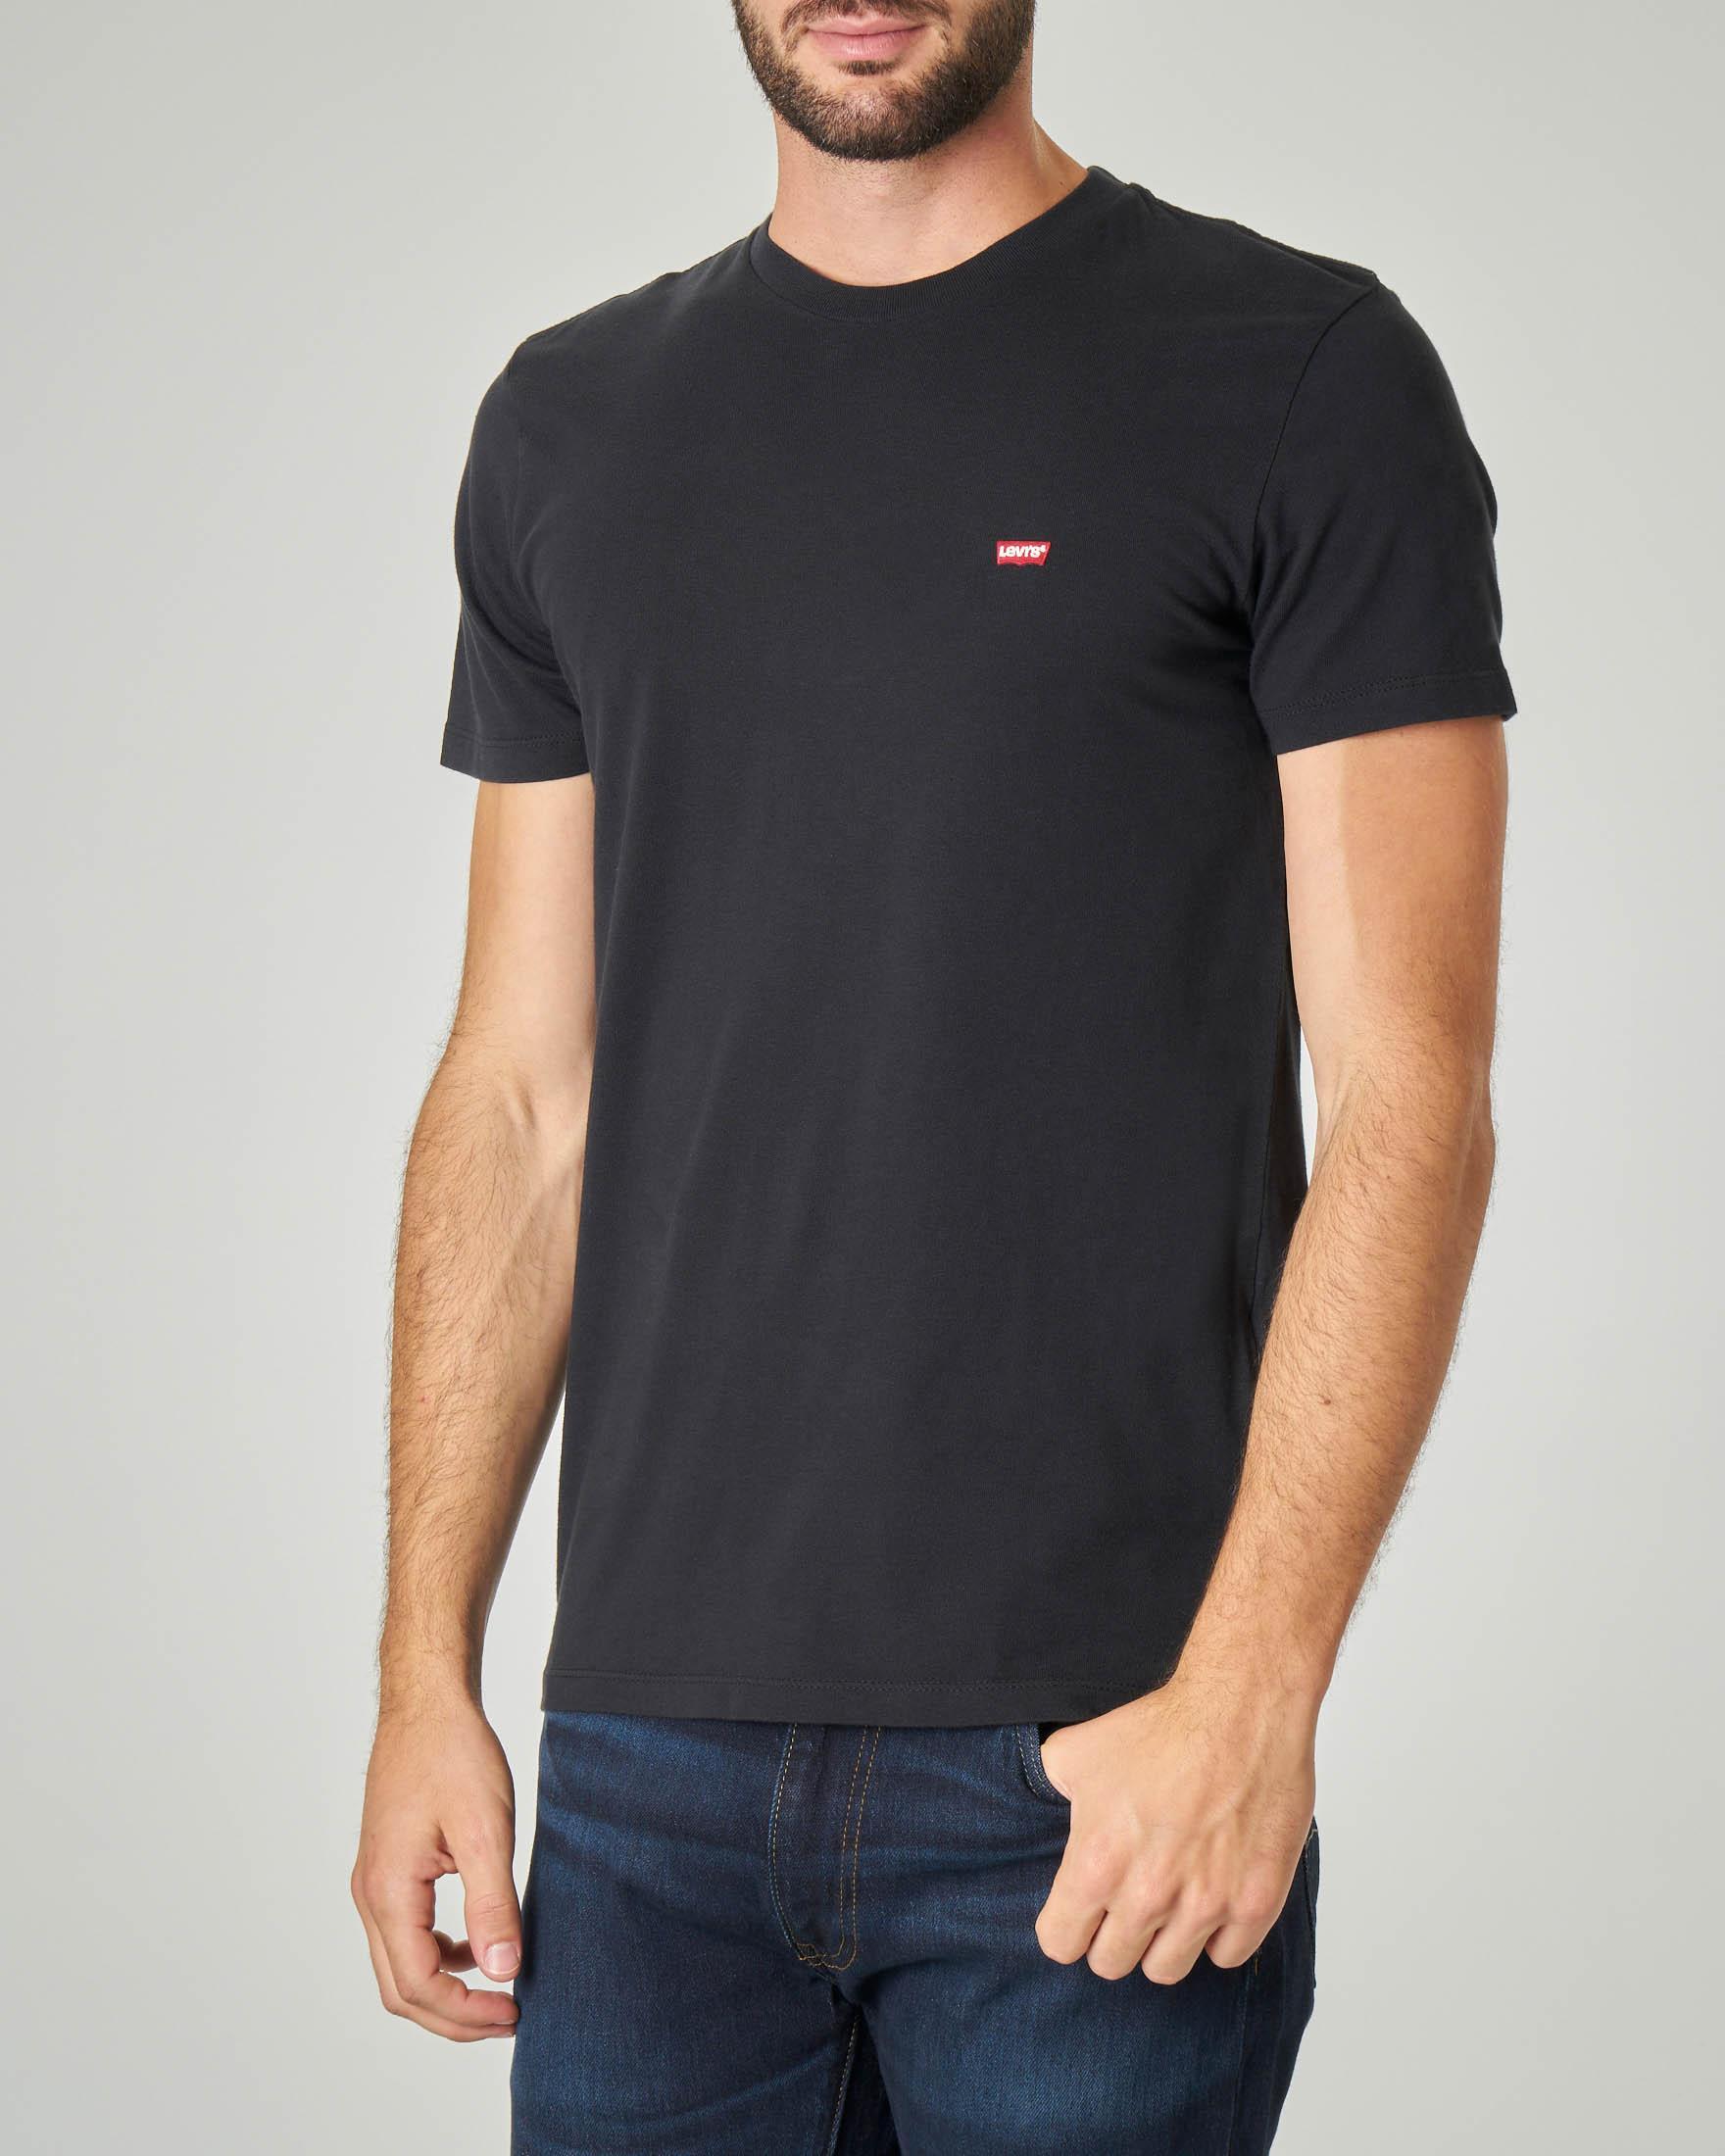 T-shirt nera con logo batwing piccolo